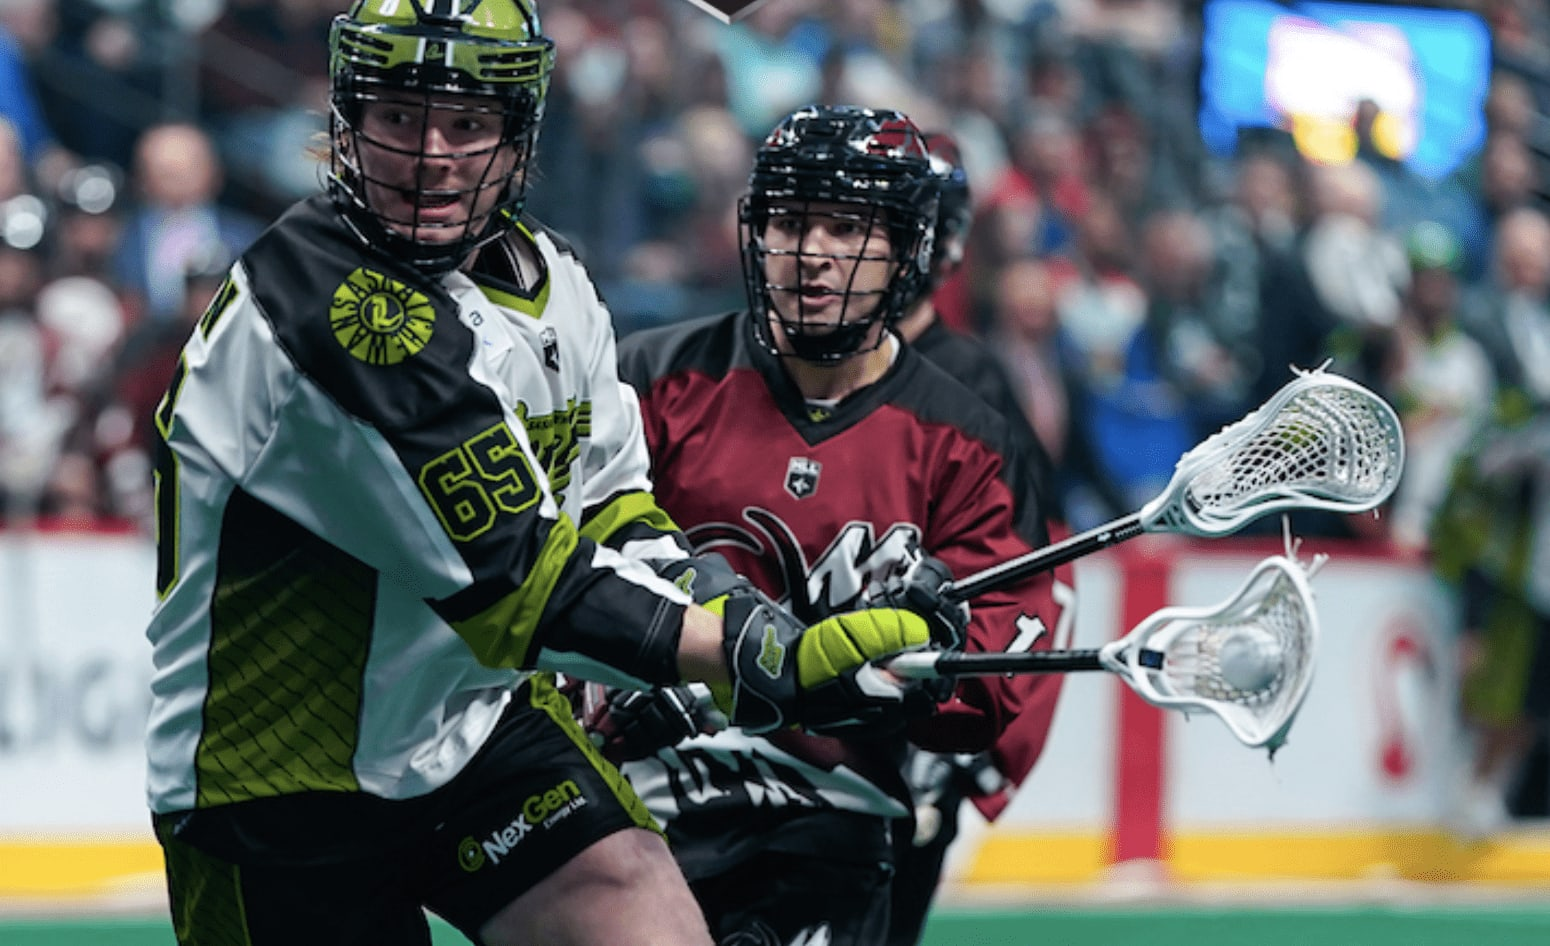 nll national lacrosse league colorado mammoth saskatchewan rush 2019-2020 nll season